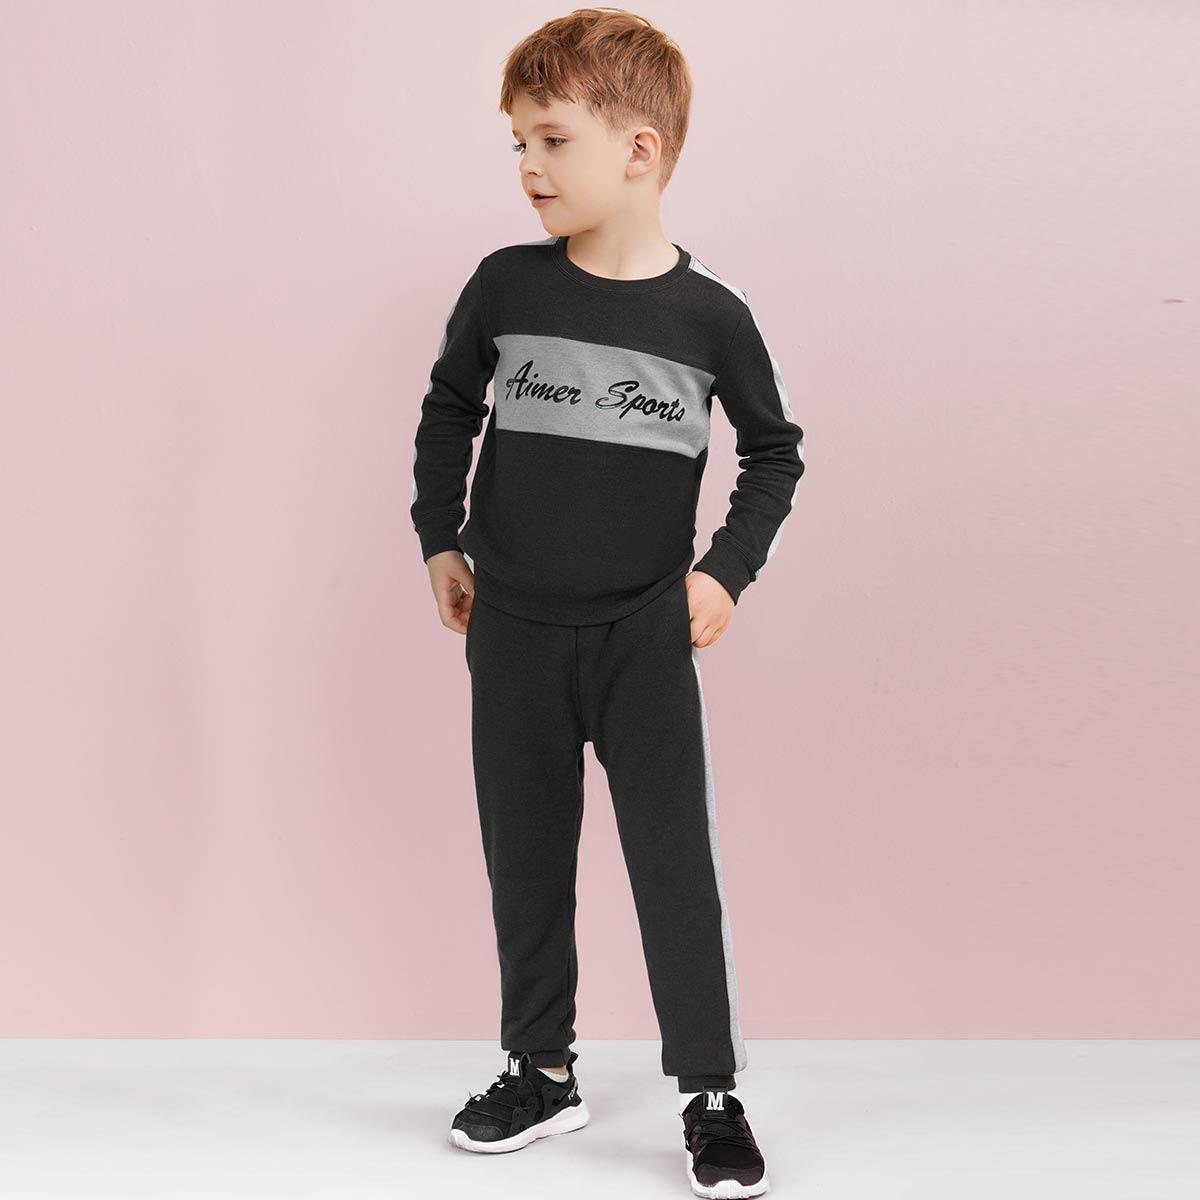 AIMER KIDSAimer Kids男童暖时尚长裤AK2730353-400